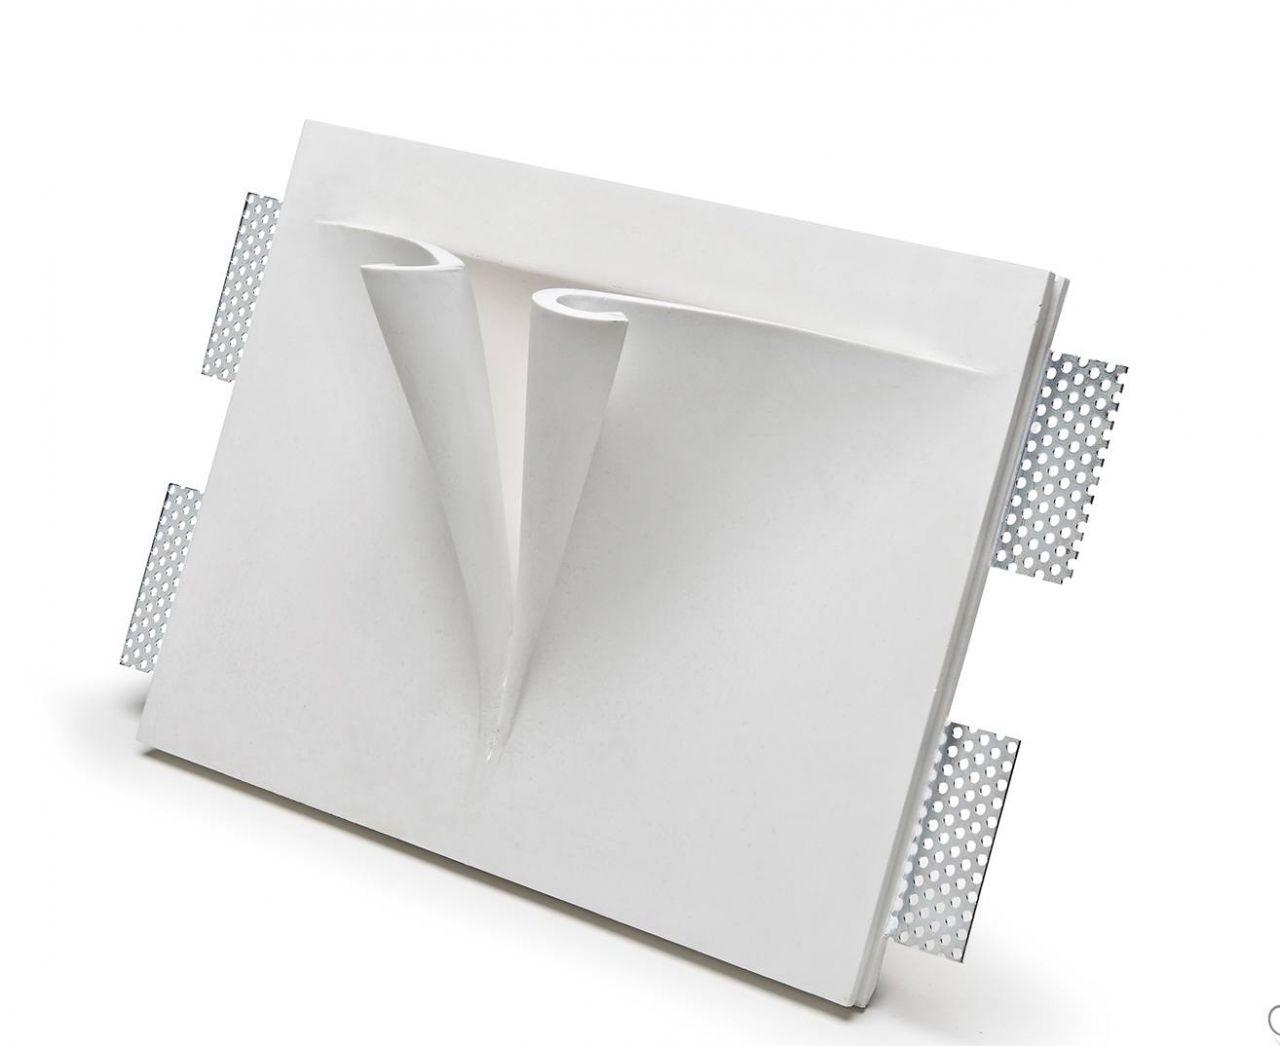 Faretti Gesso Isyluce: Isyluce spot cubo in gesso bianco da soffitto.